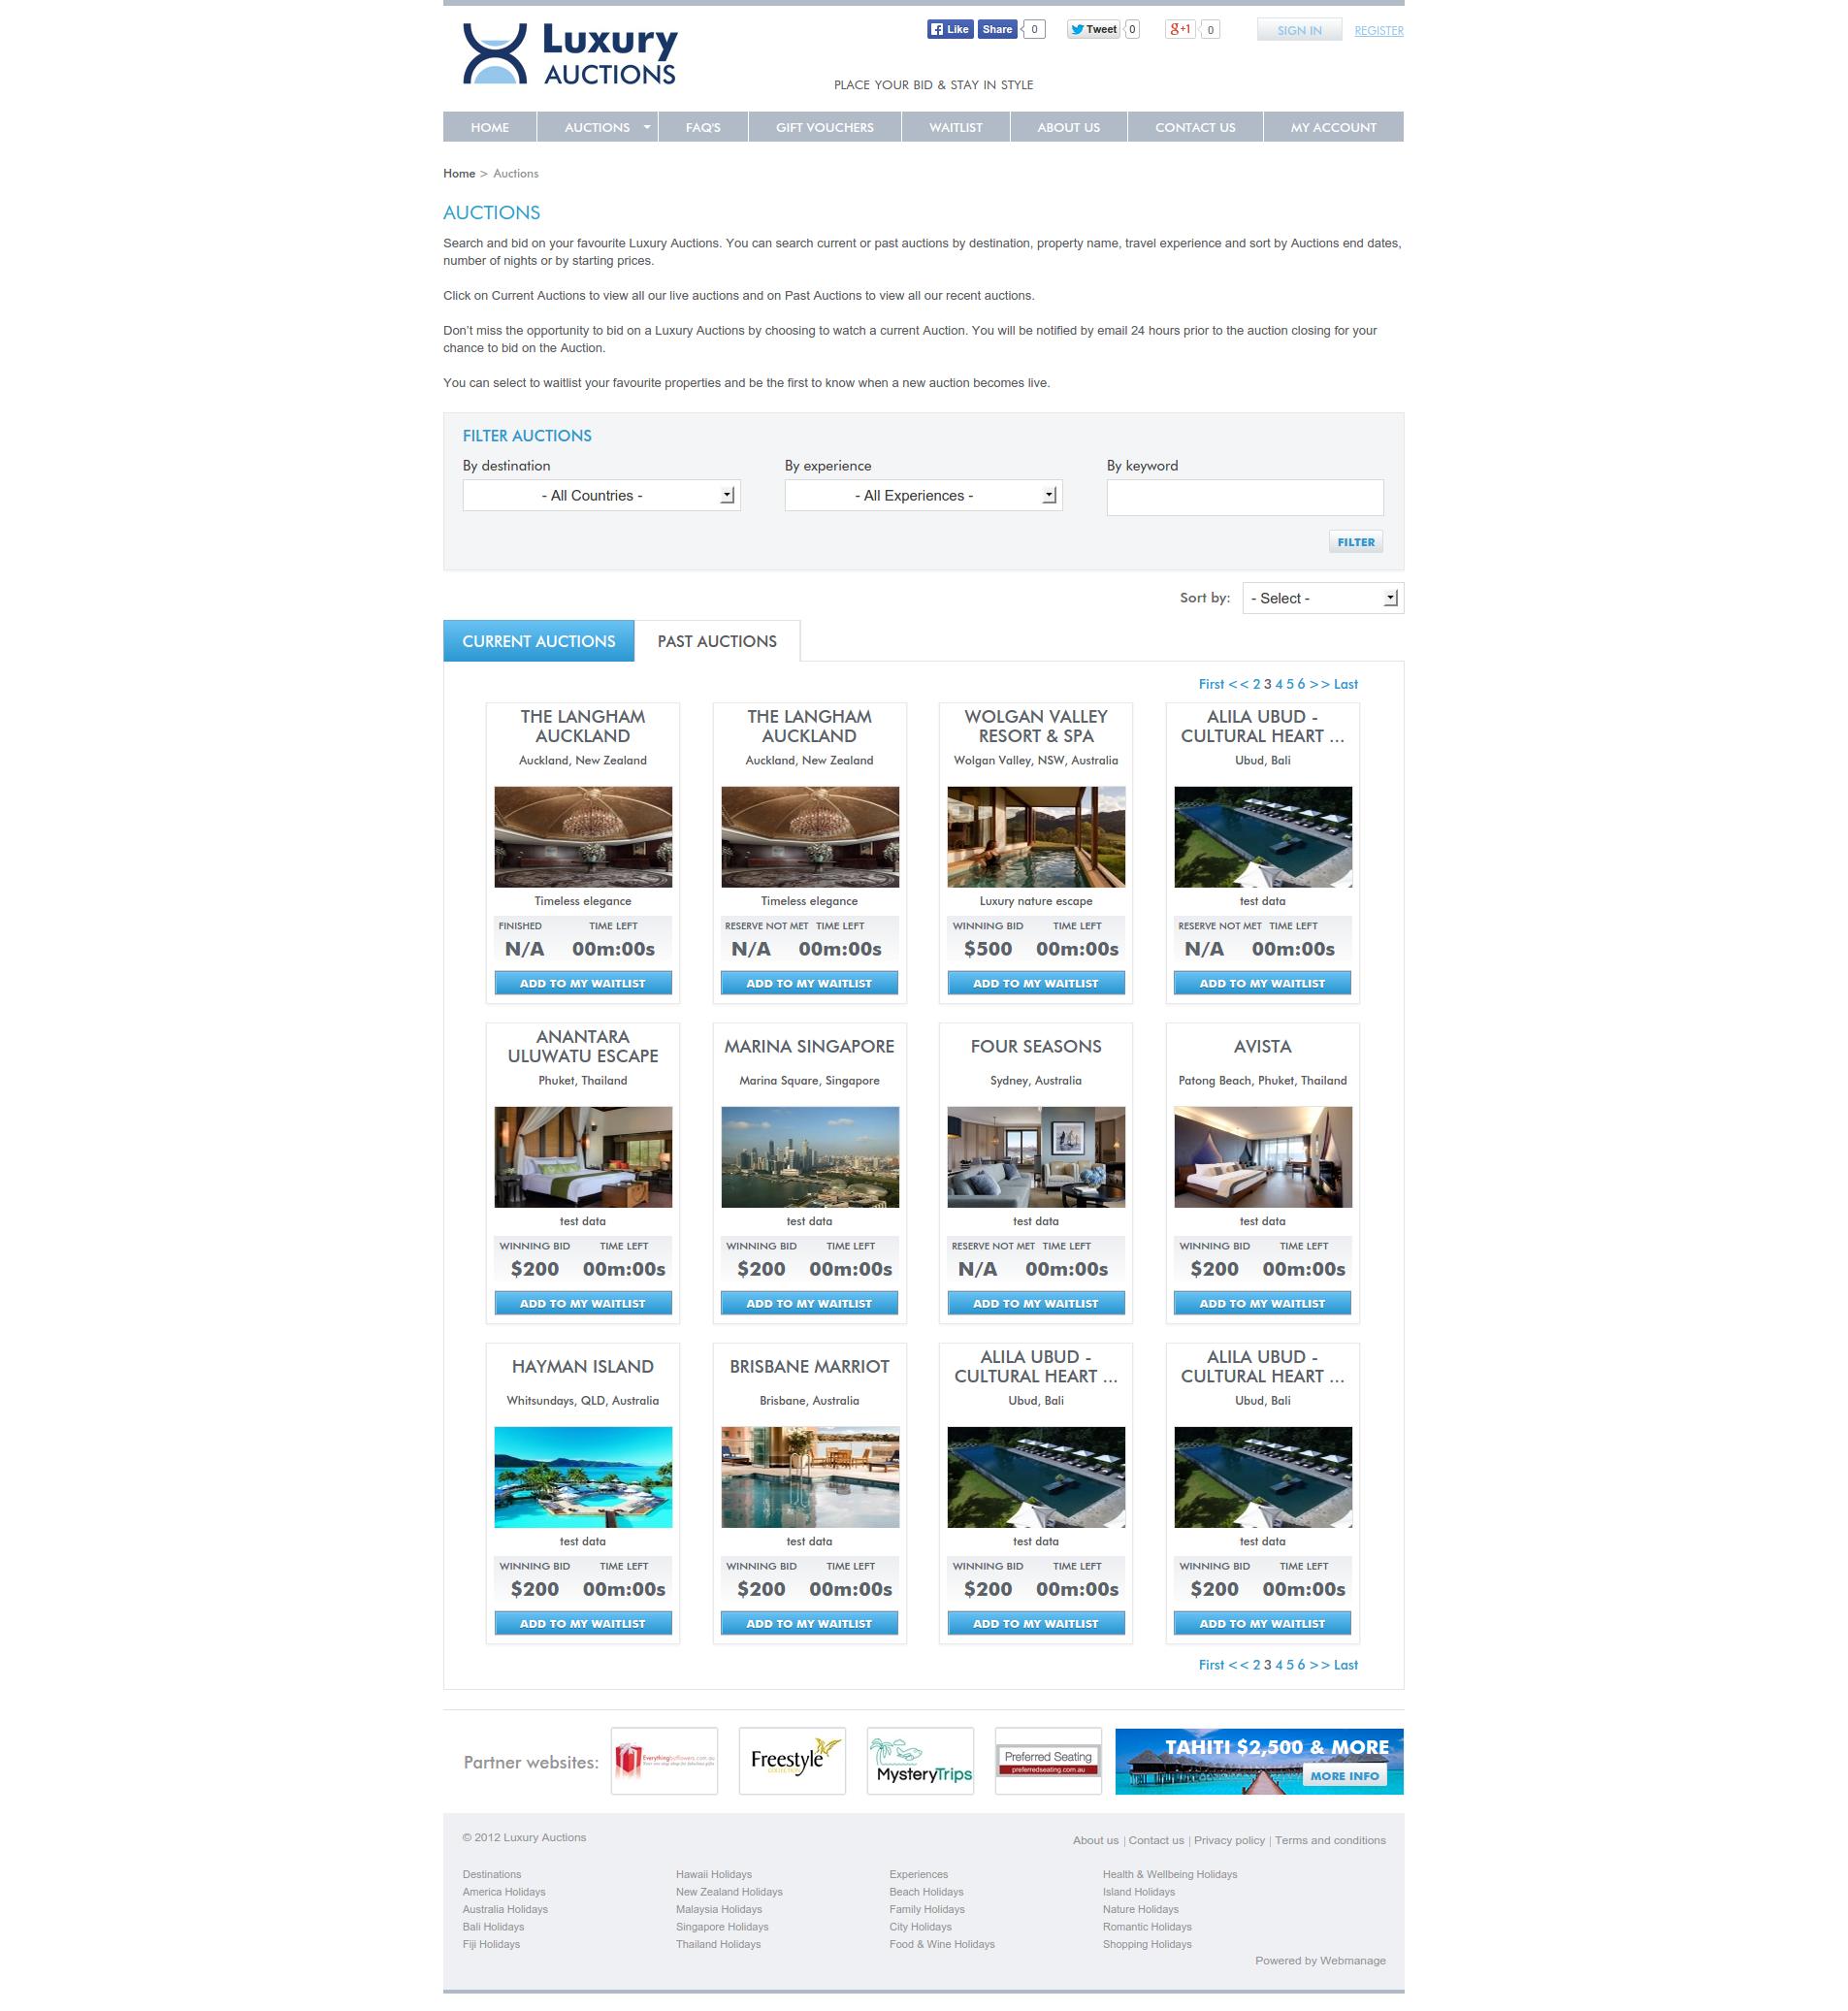 Luxury Travel Auction - Listing